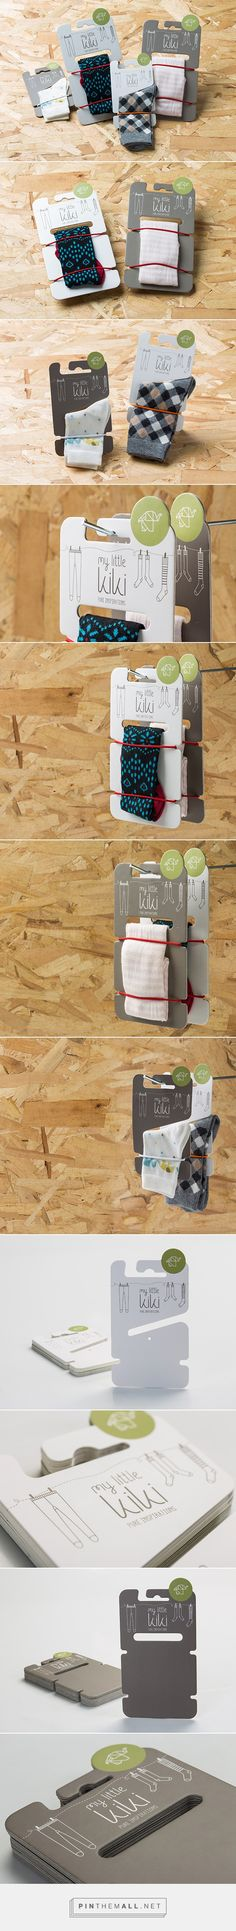 My little Kiki by Maria Romanidou Scarf Packaging, Cool Packaging, Brand Packaging, Uni Bag, Packing Clothes, Funky Socks, Branding, Designer Socks, Packaging Design Inspiration